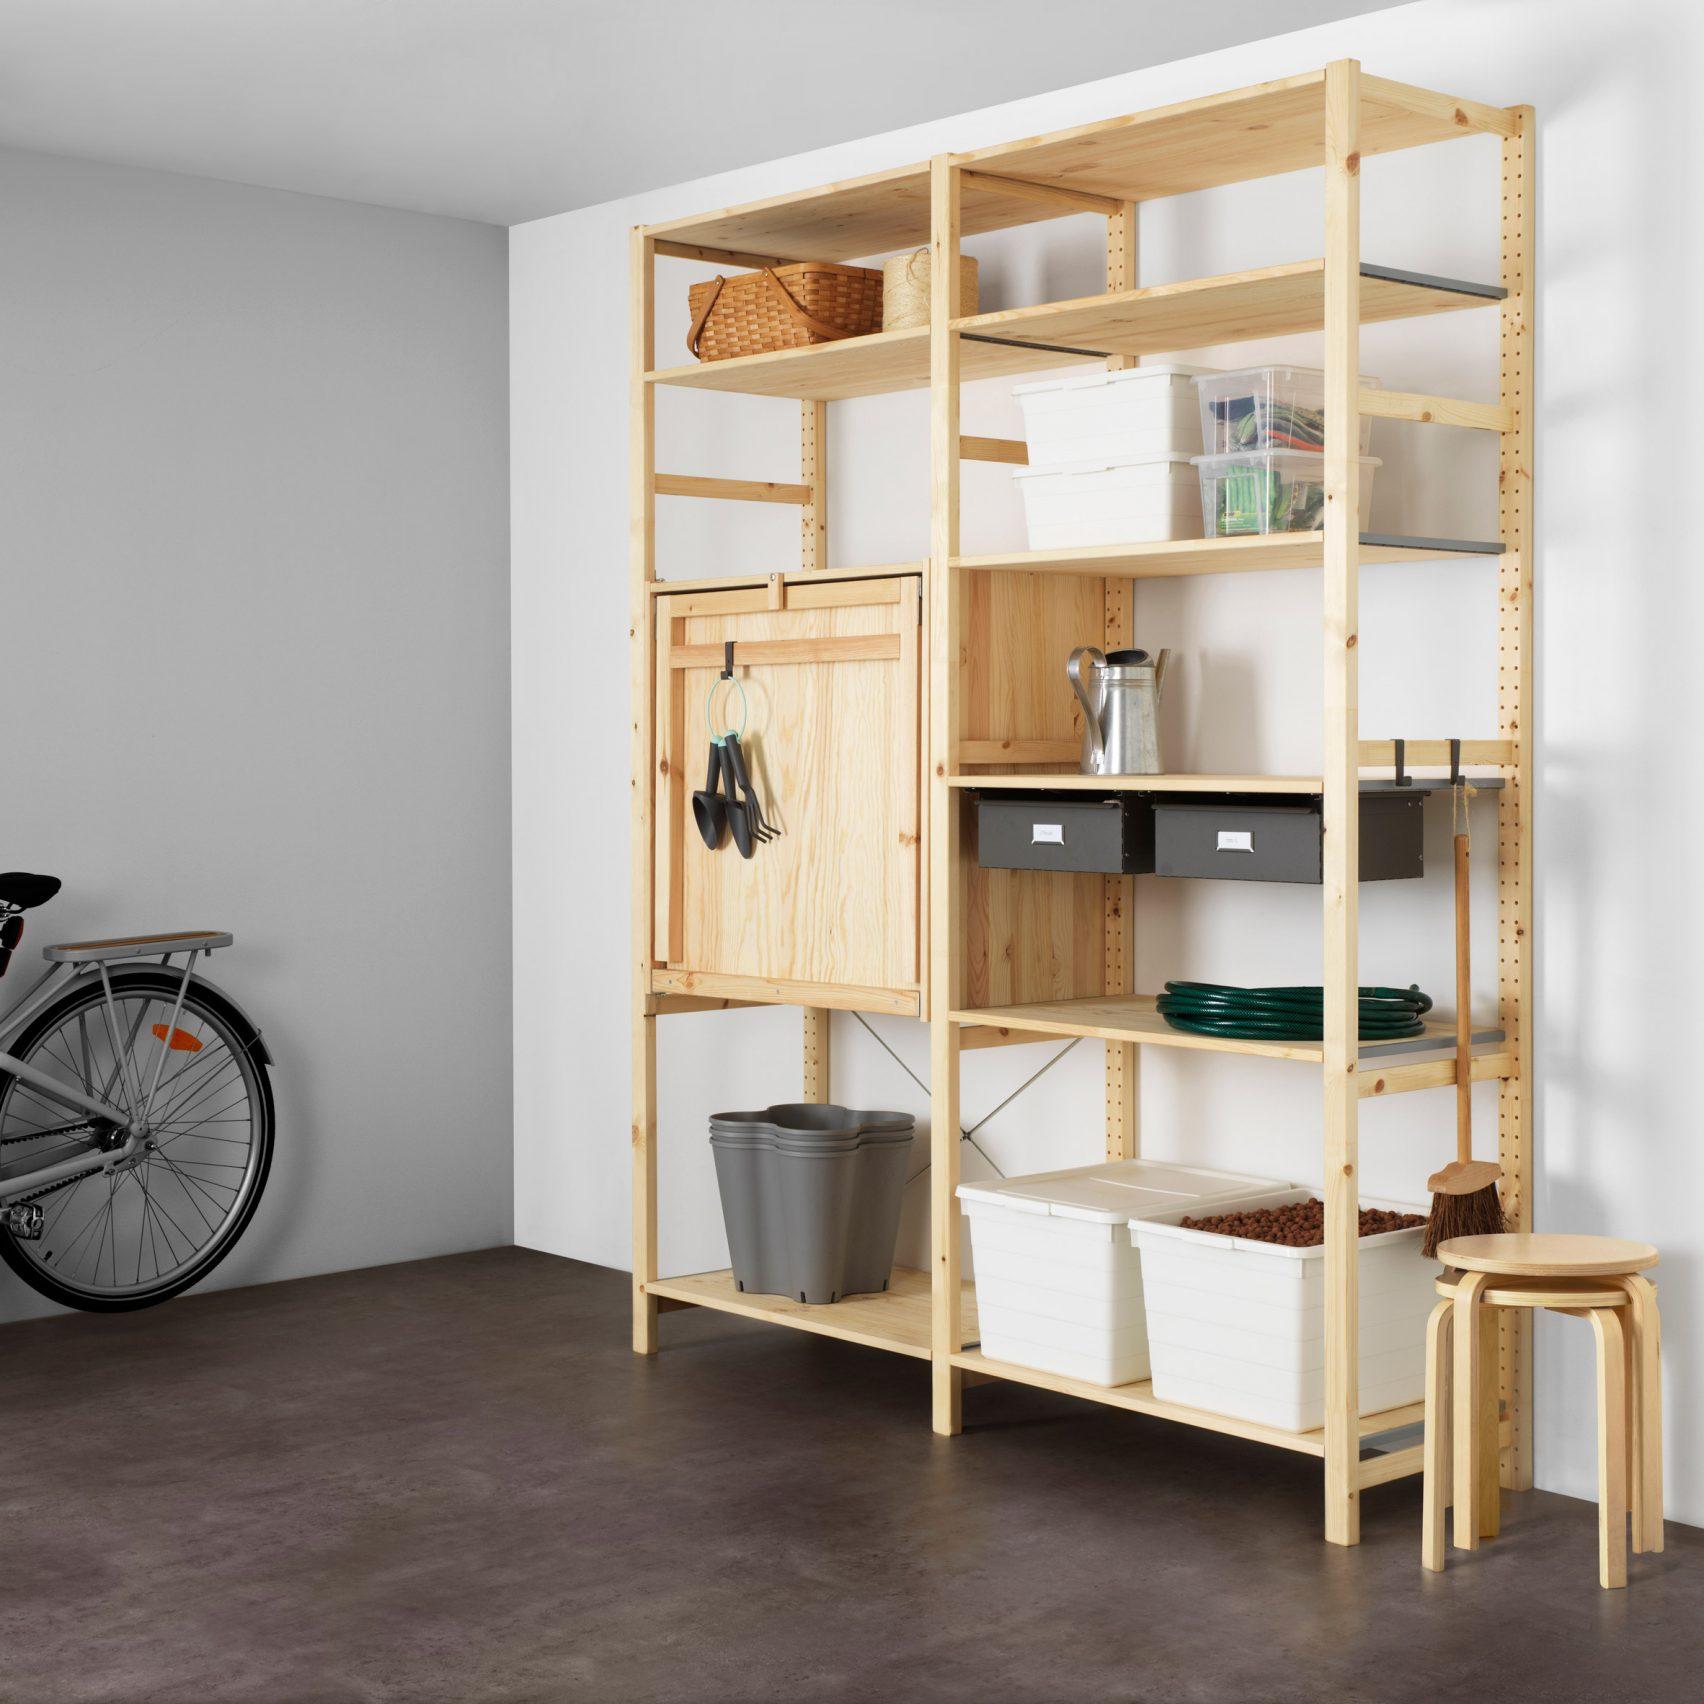 Икеа, IKEA, Система хранения Ivar